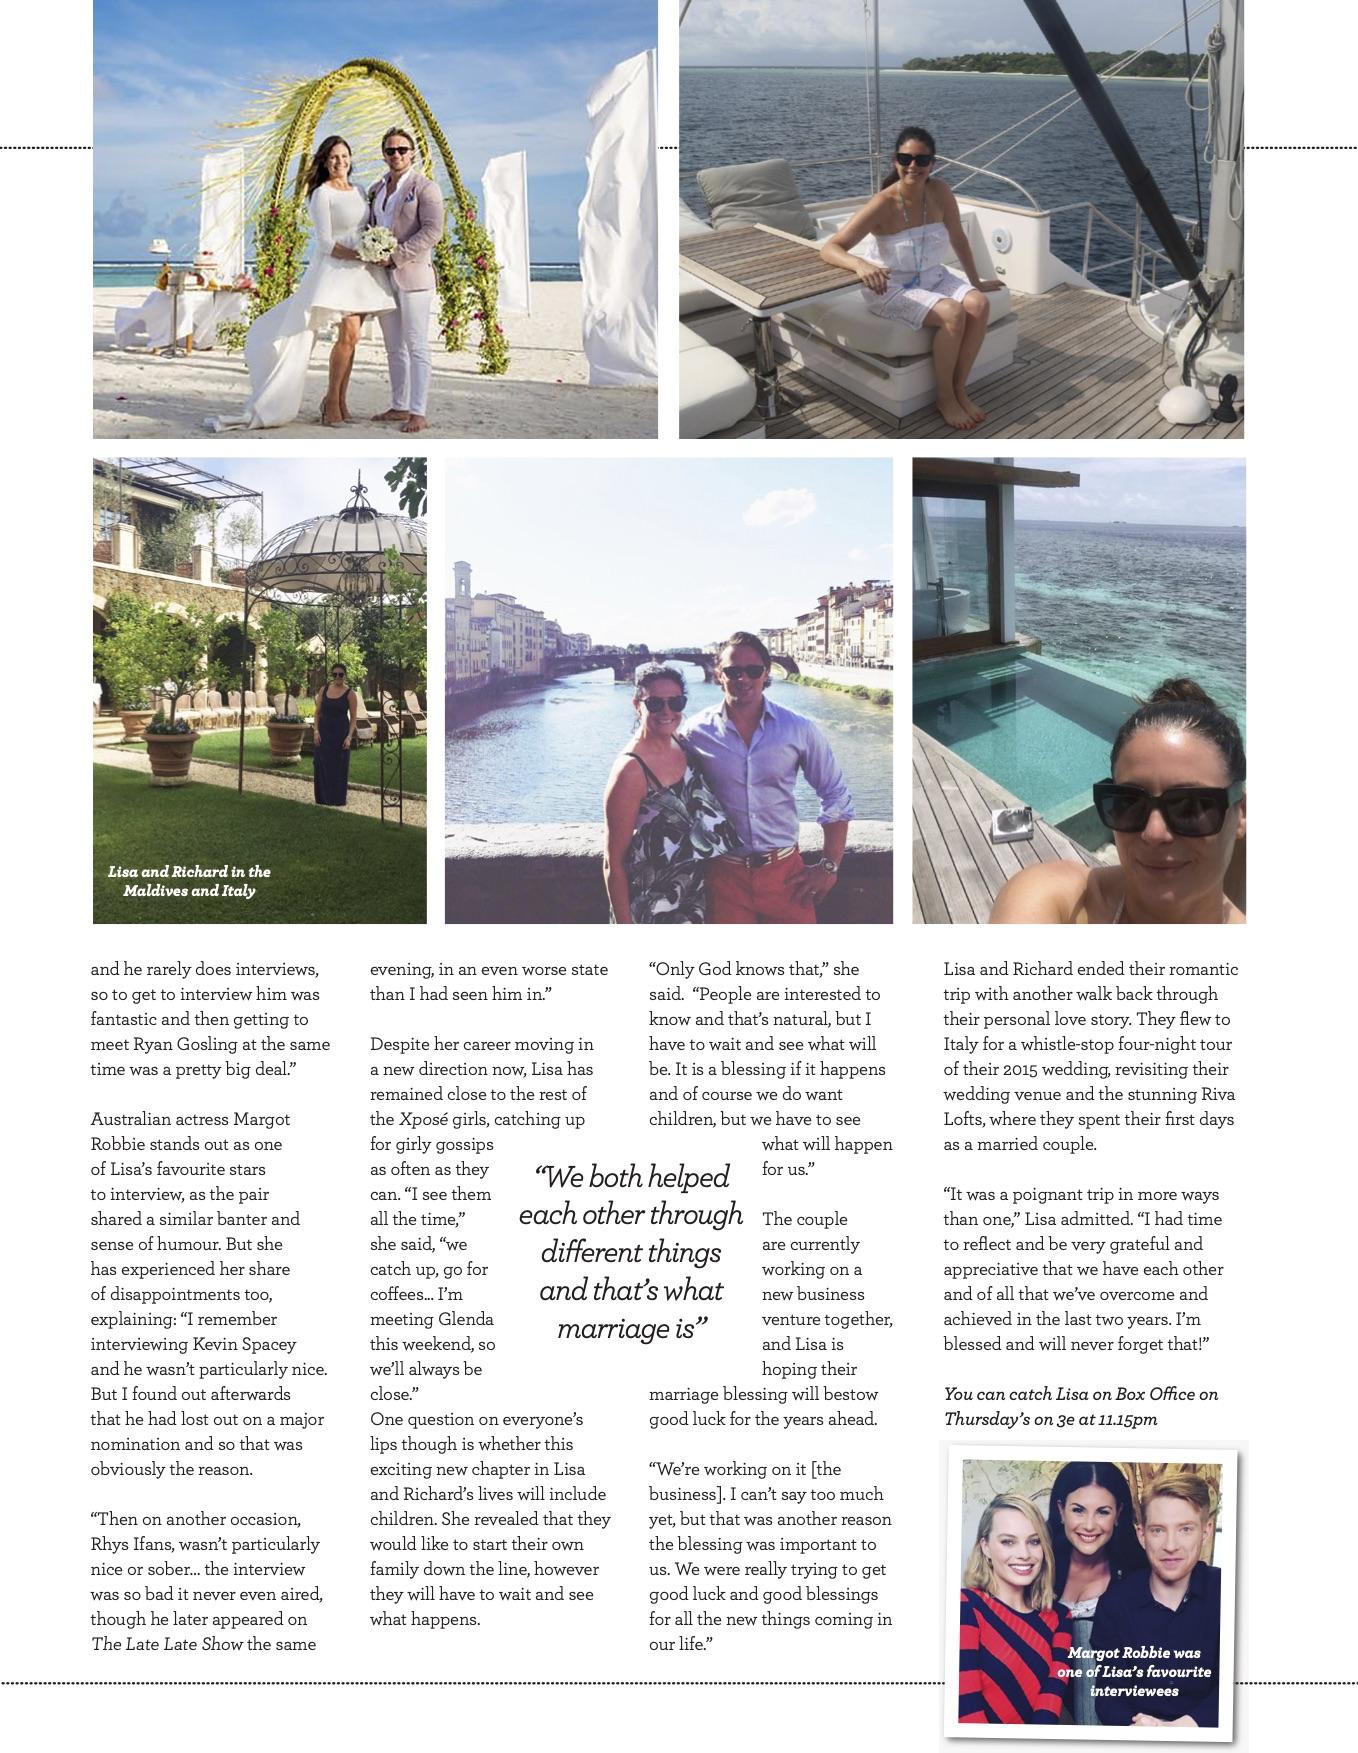 RSVP Lisa Cannon Maldives (1) pg 2